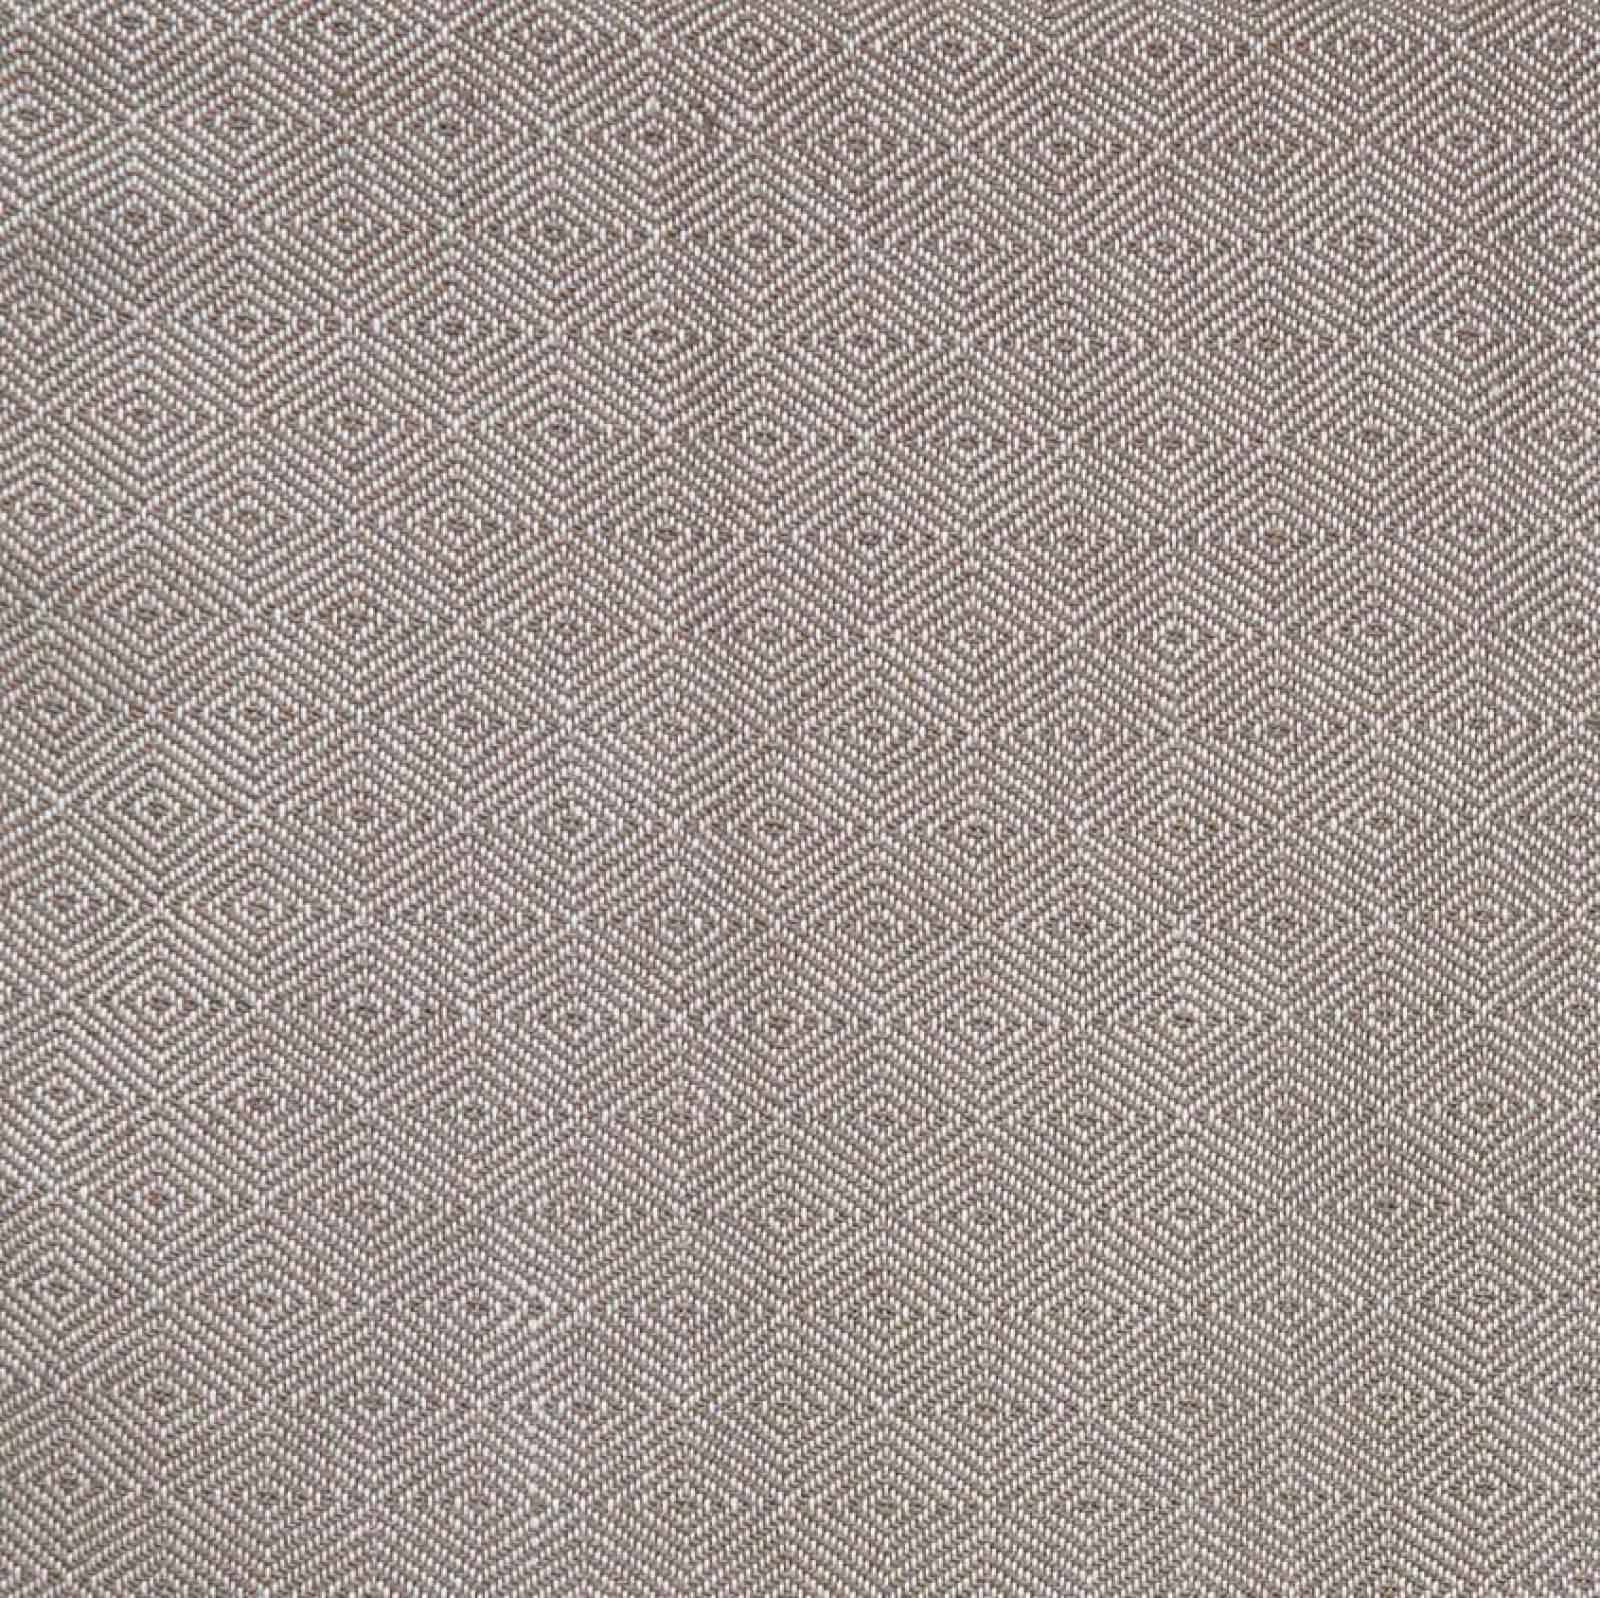 Monsoon Diamond Blanket From Recycled Bottles thumbnails